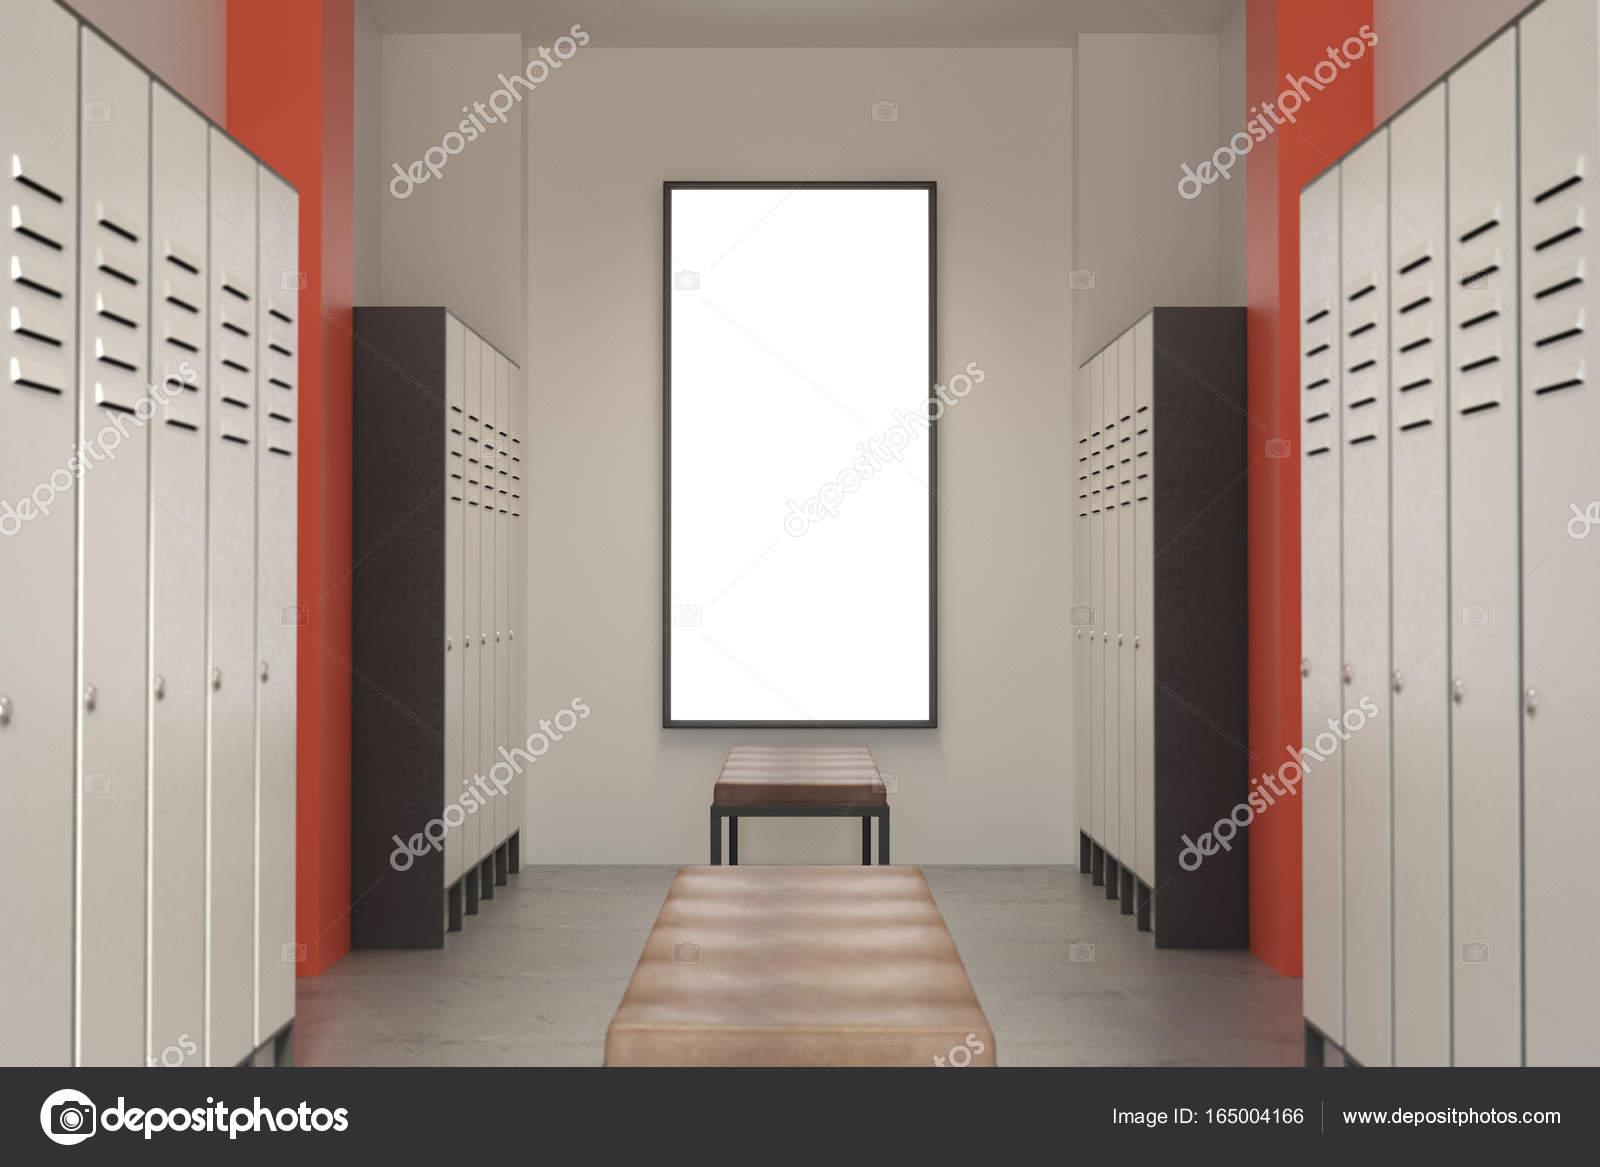 Chambre Moderne De Locker Vert Avec Enseigne Photographie Peshkova